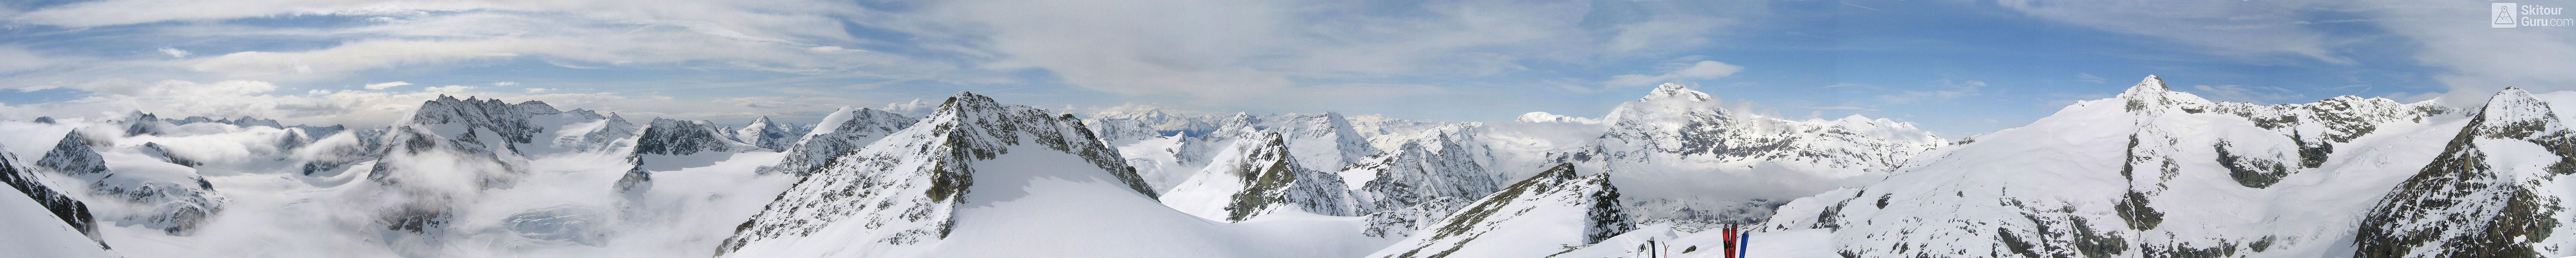 La Ruinette Walliser Alpen / Alpes valaisannes Švýcarsko panorama 06